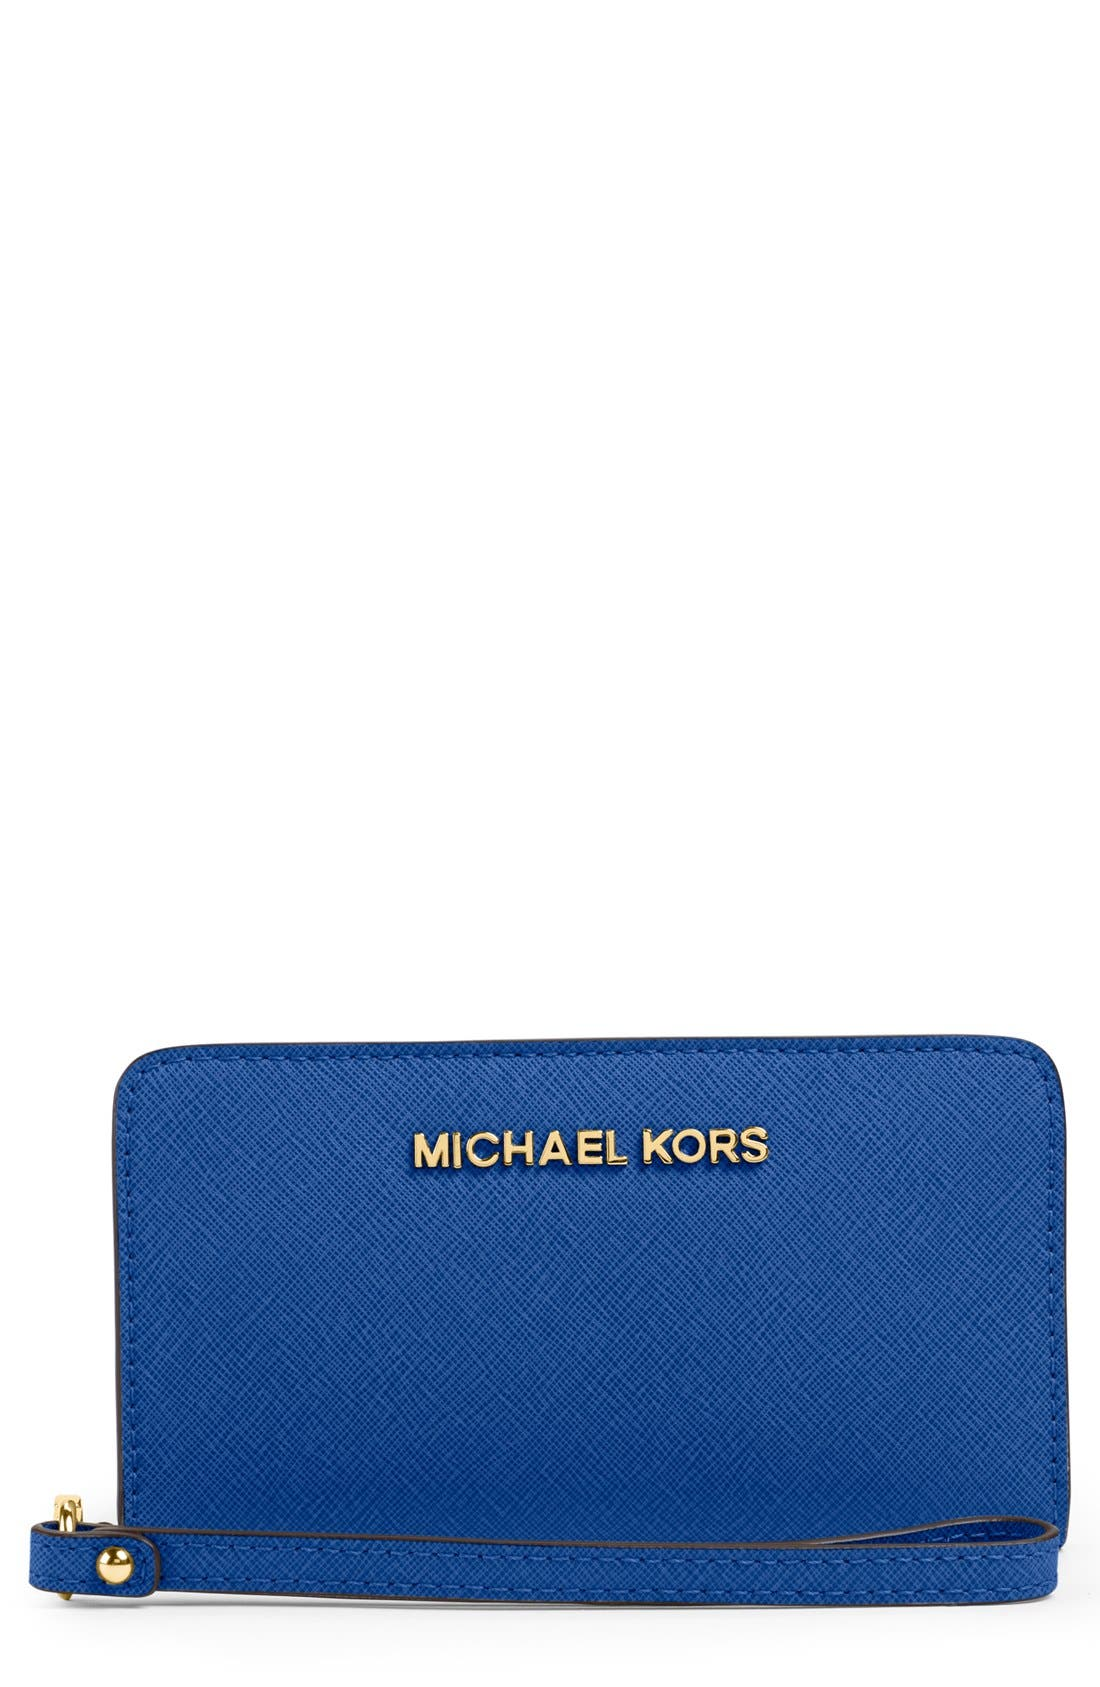 Main Image - MICHAEL Michael Kors Saffiano Phone Wallet